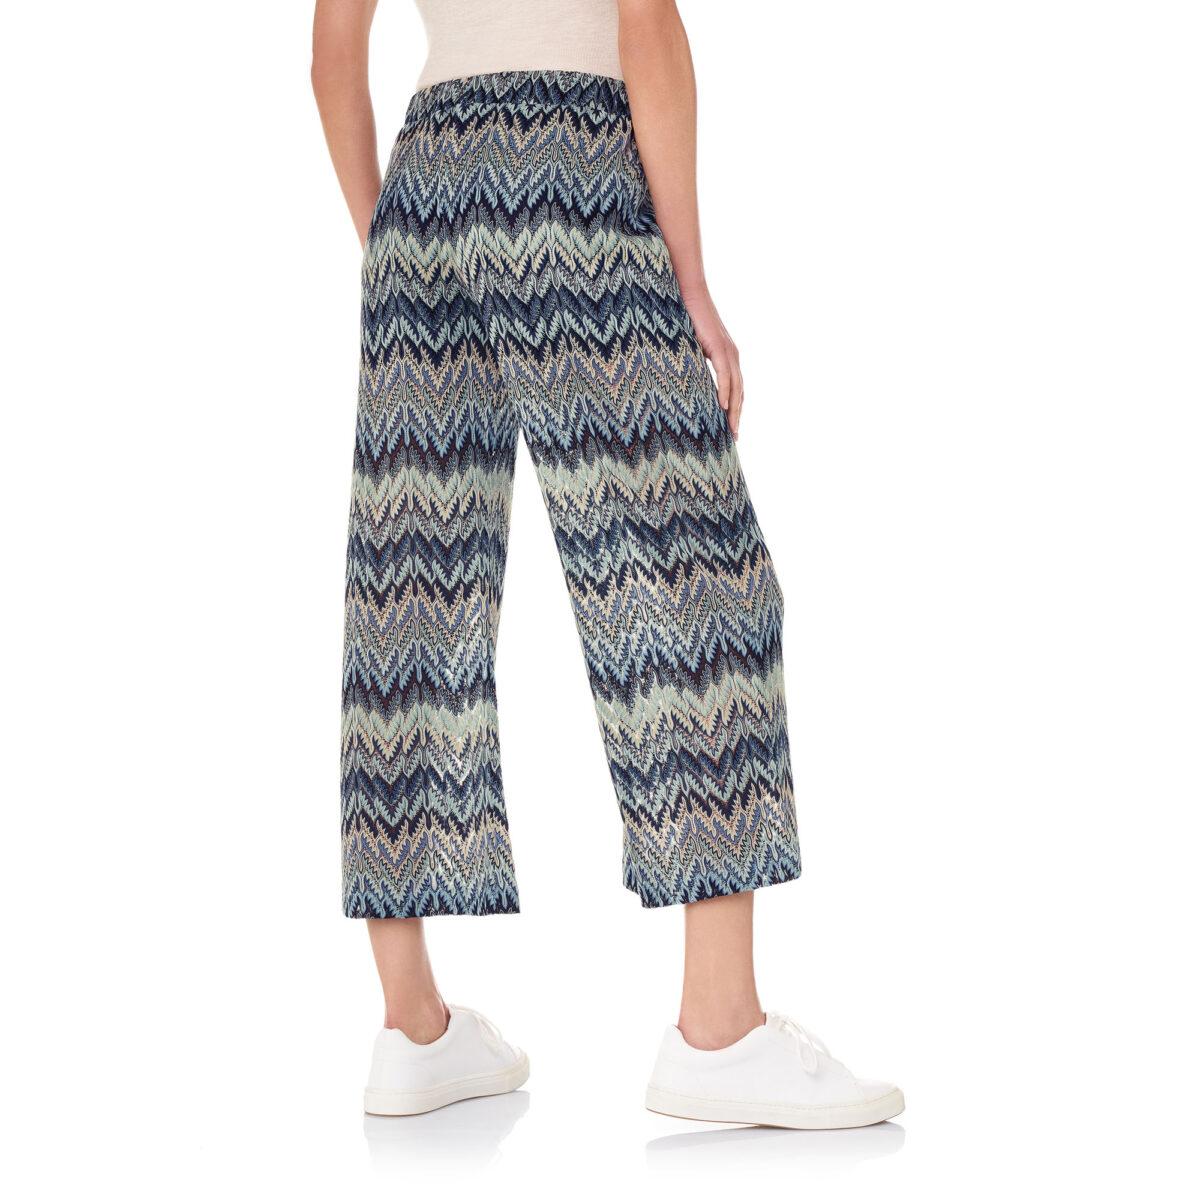 Pantalone Cropped a maglia raschel Blu - Nicla